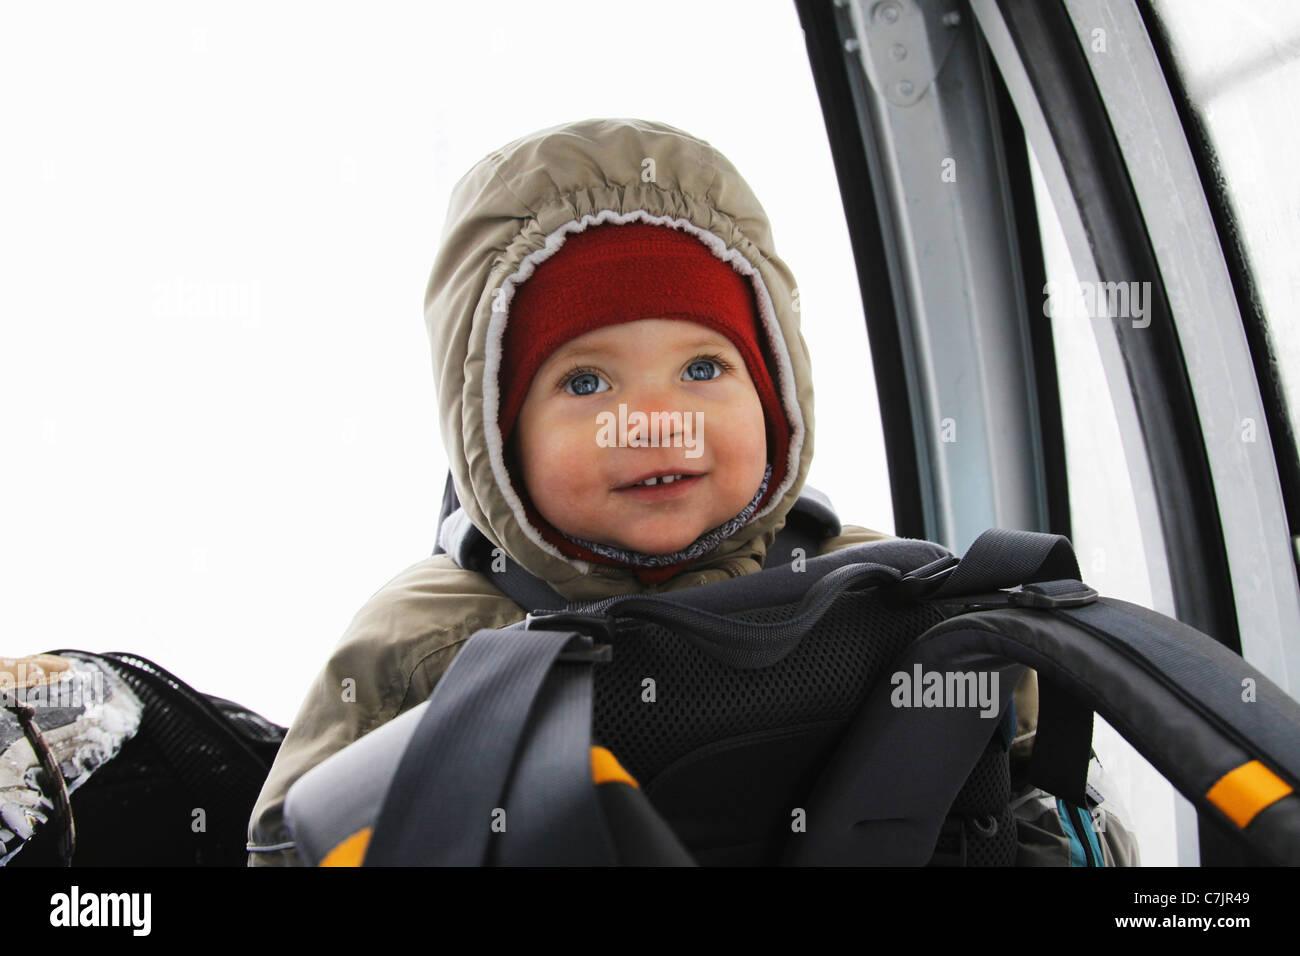 5032d4057de8 Child wearing ski gear Stock Photo  39136617 - Alamy